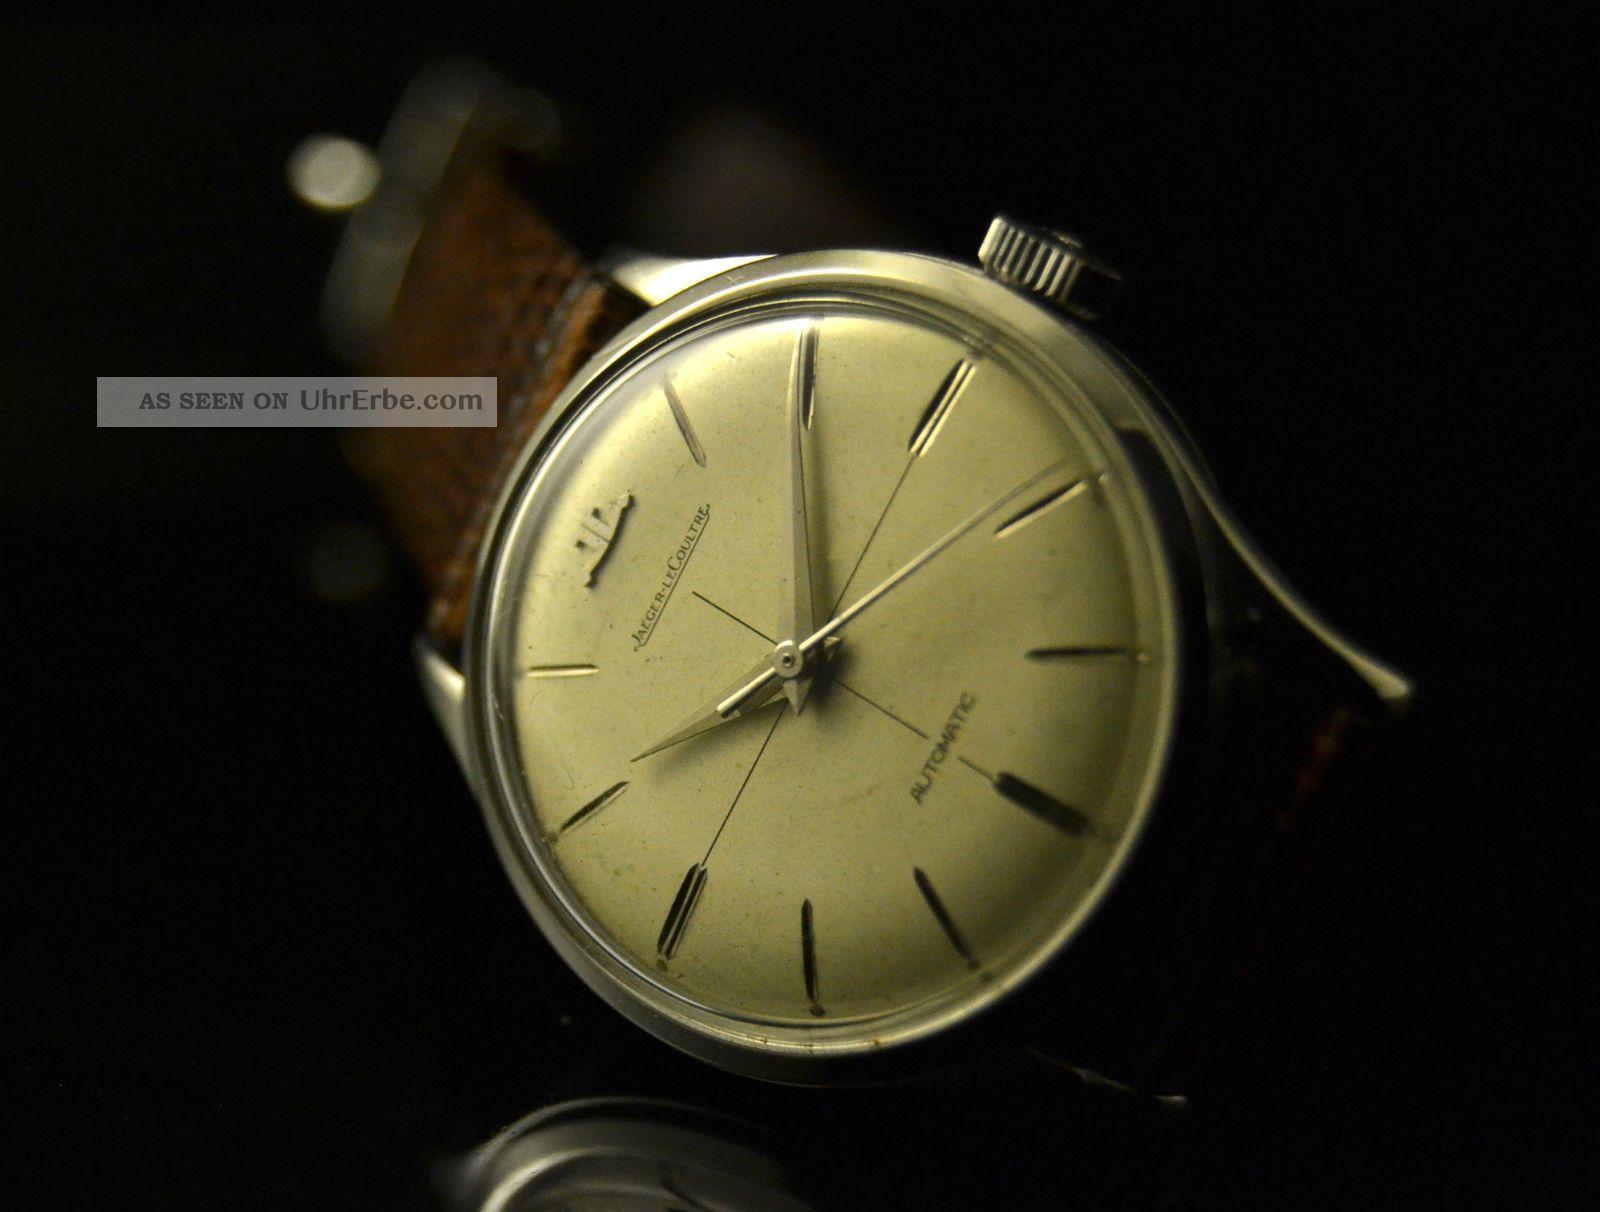 Jaeger Lecoultre E390 Automatic,  Stainless Steel Case,  Vintage Watch Cal.  K880 Armbanduhren Bild